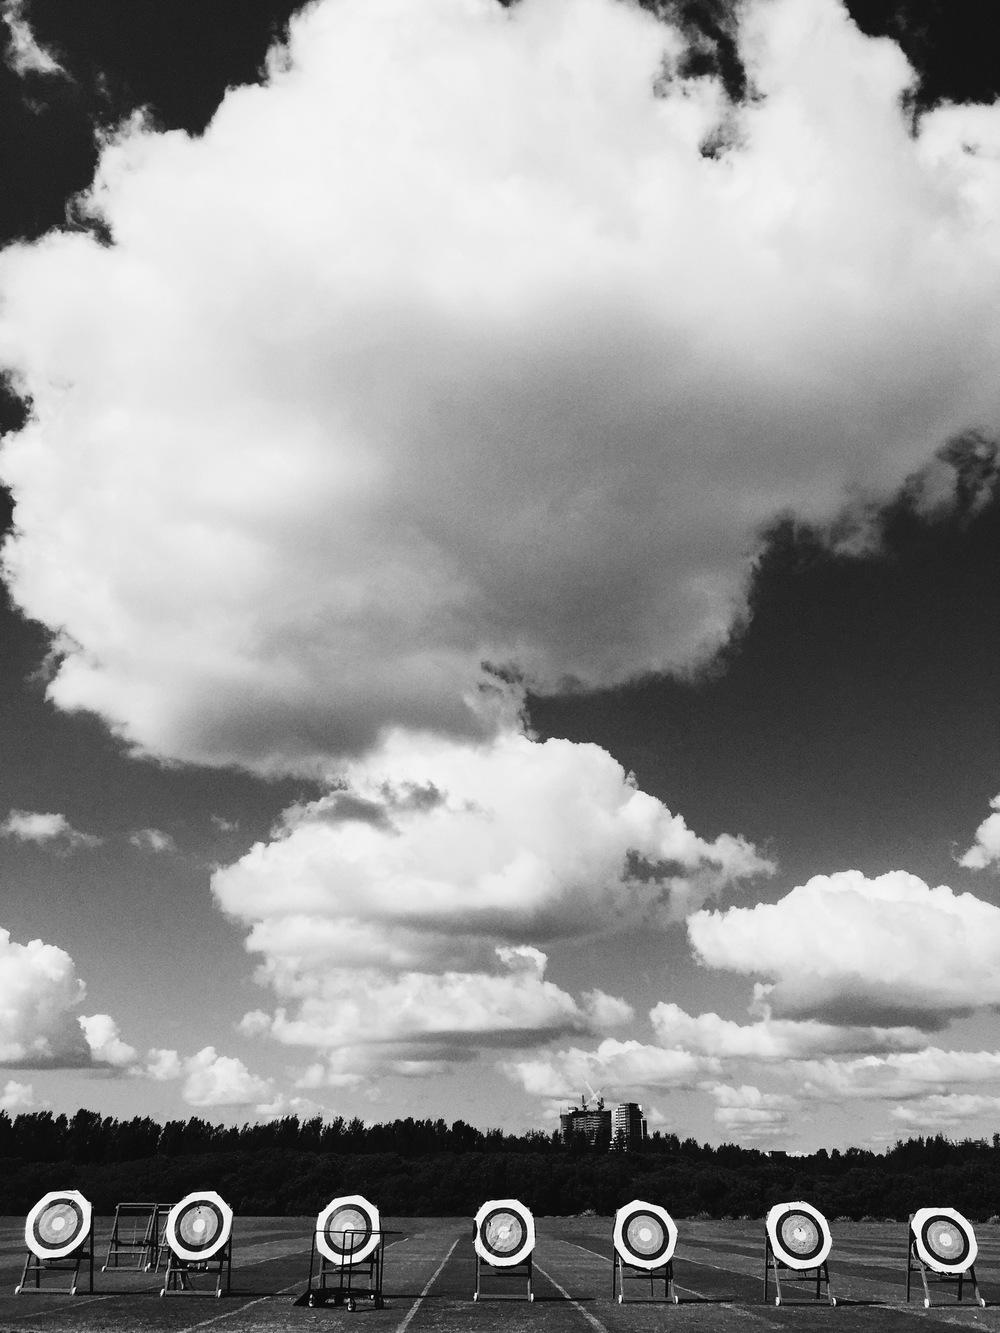 Photo 27-09-2014 09 30 16.jpg